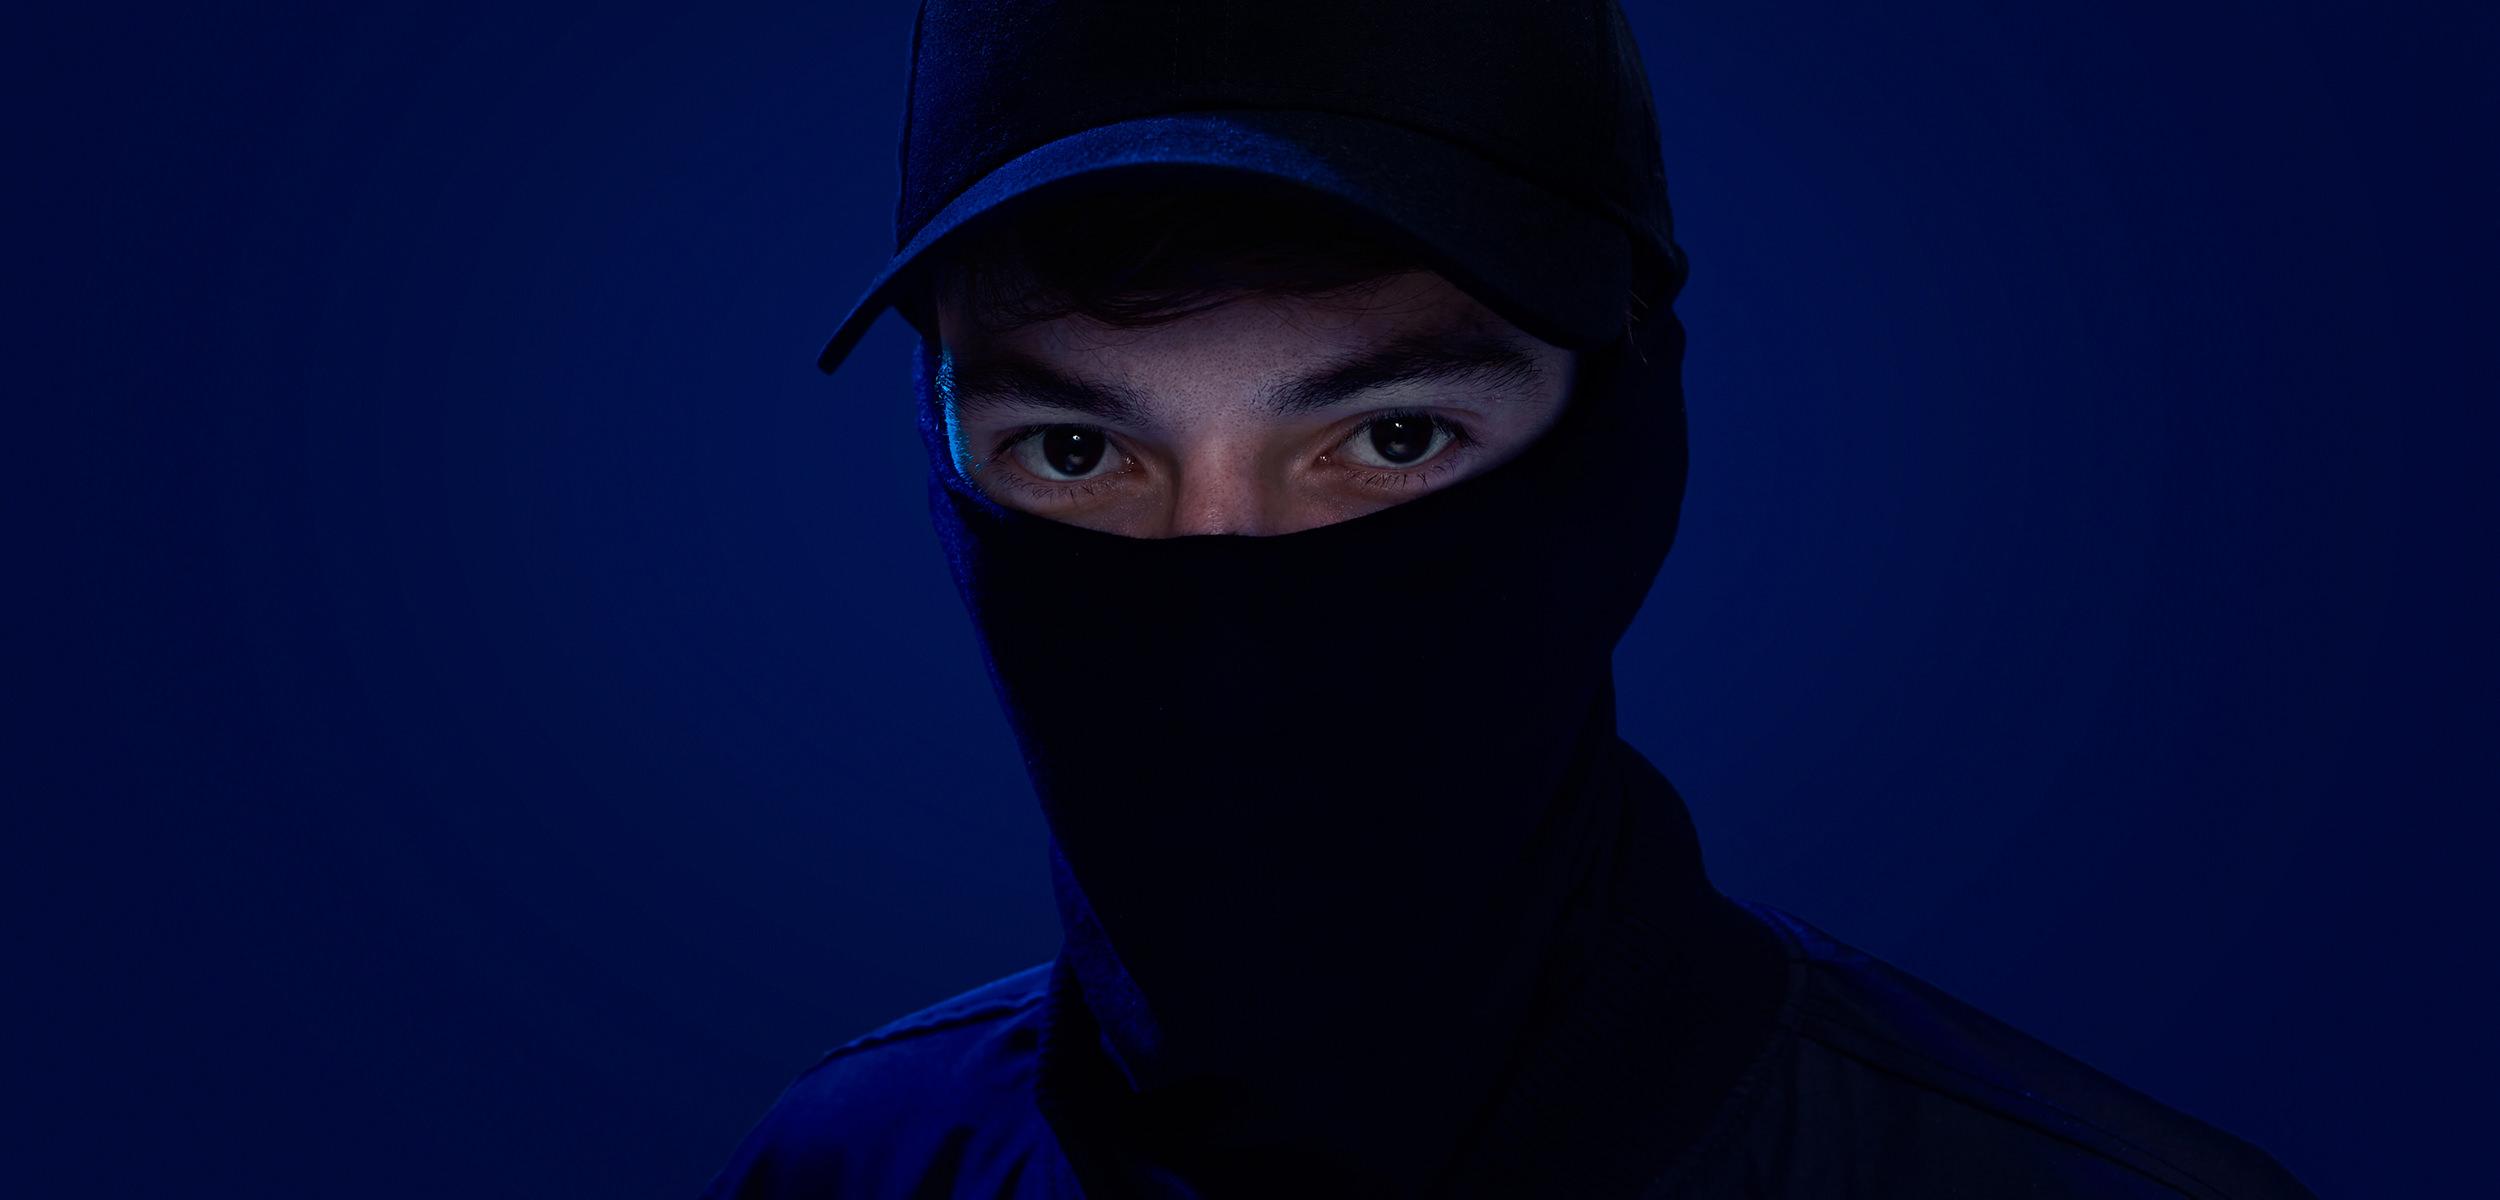 jugende musiker elektro pop köln musik blau hintergrund maskiert studio fotografie